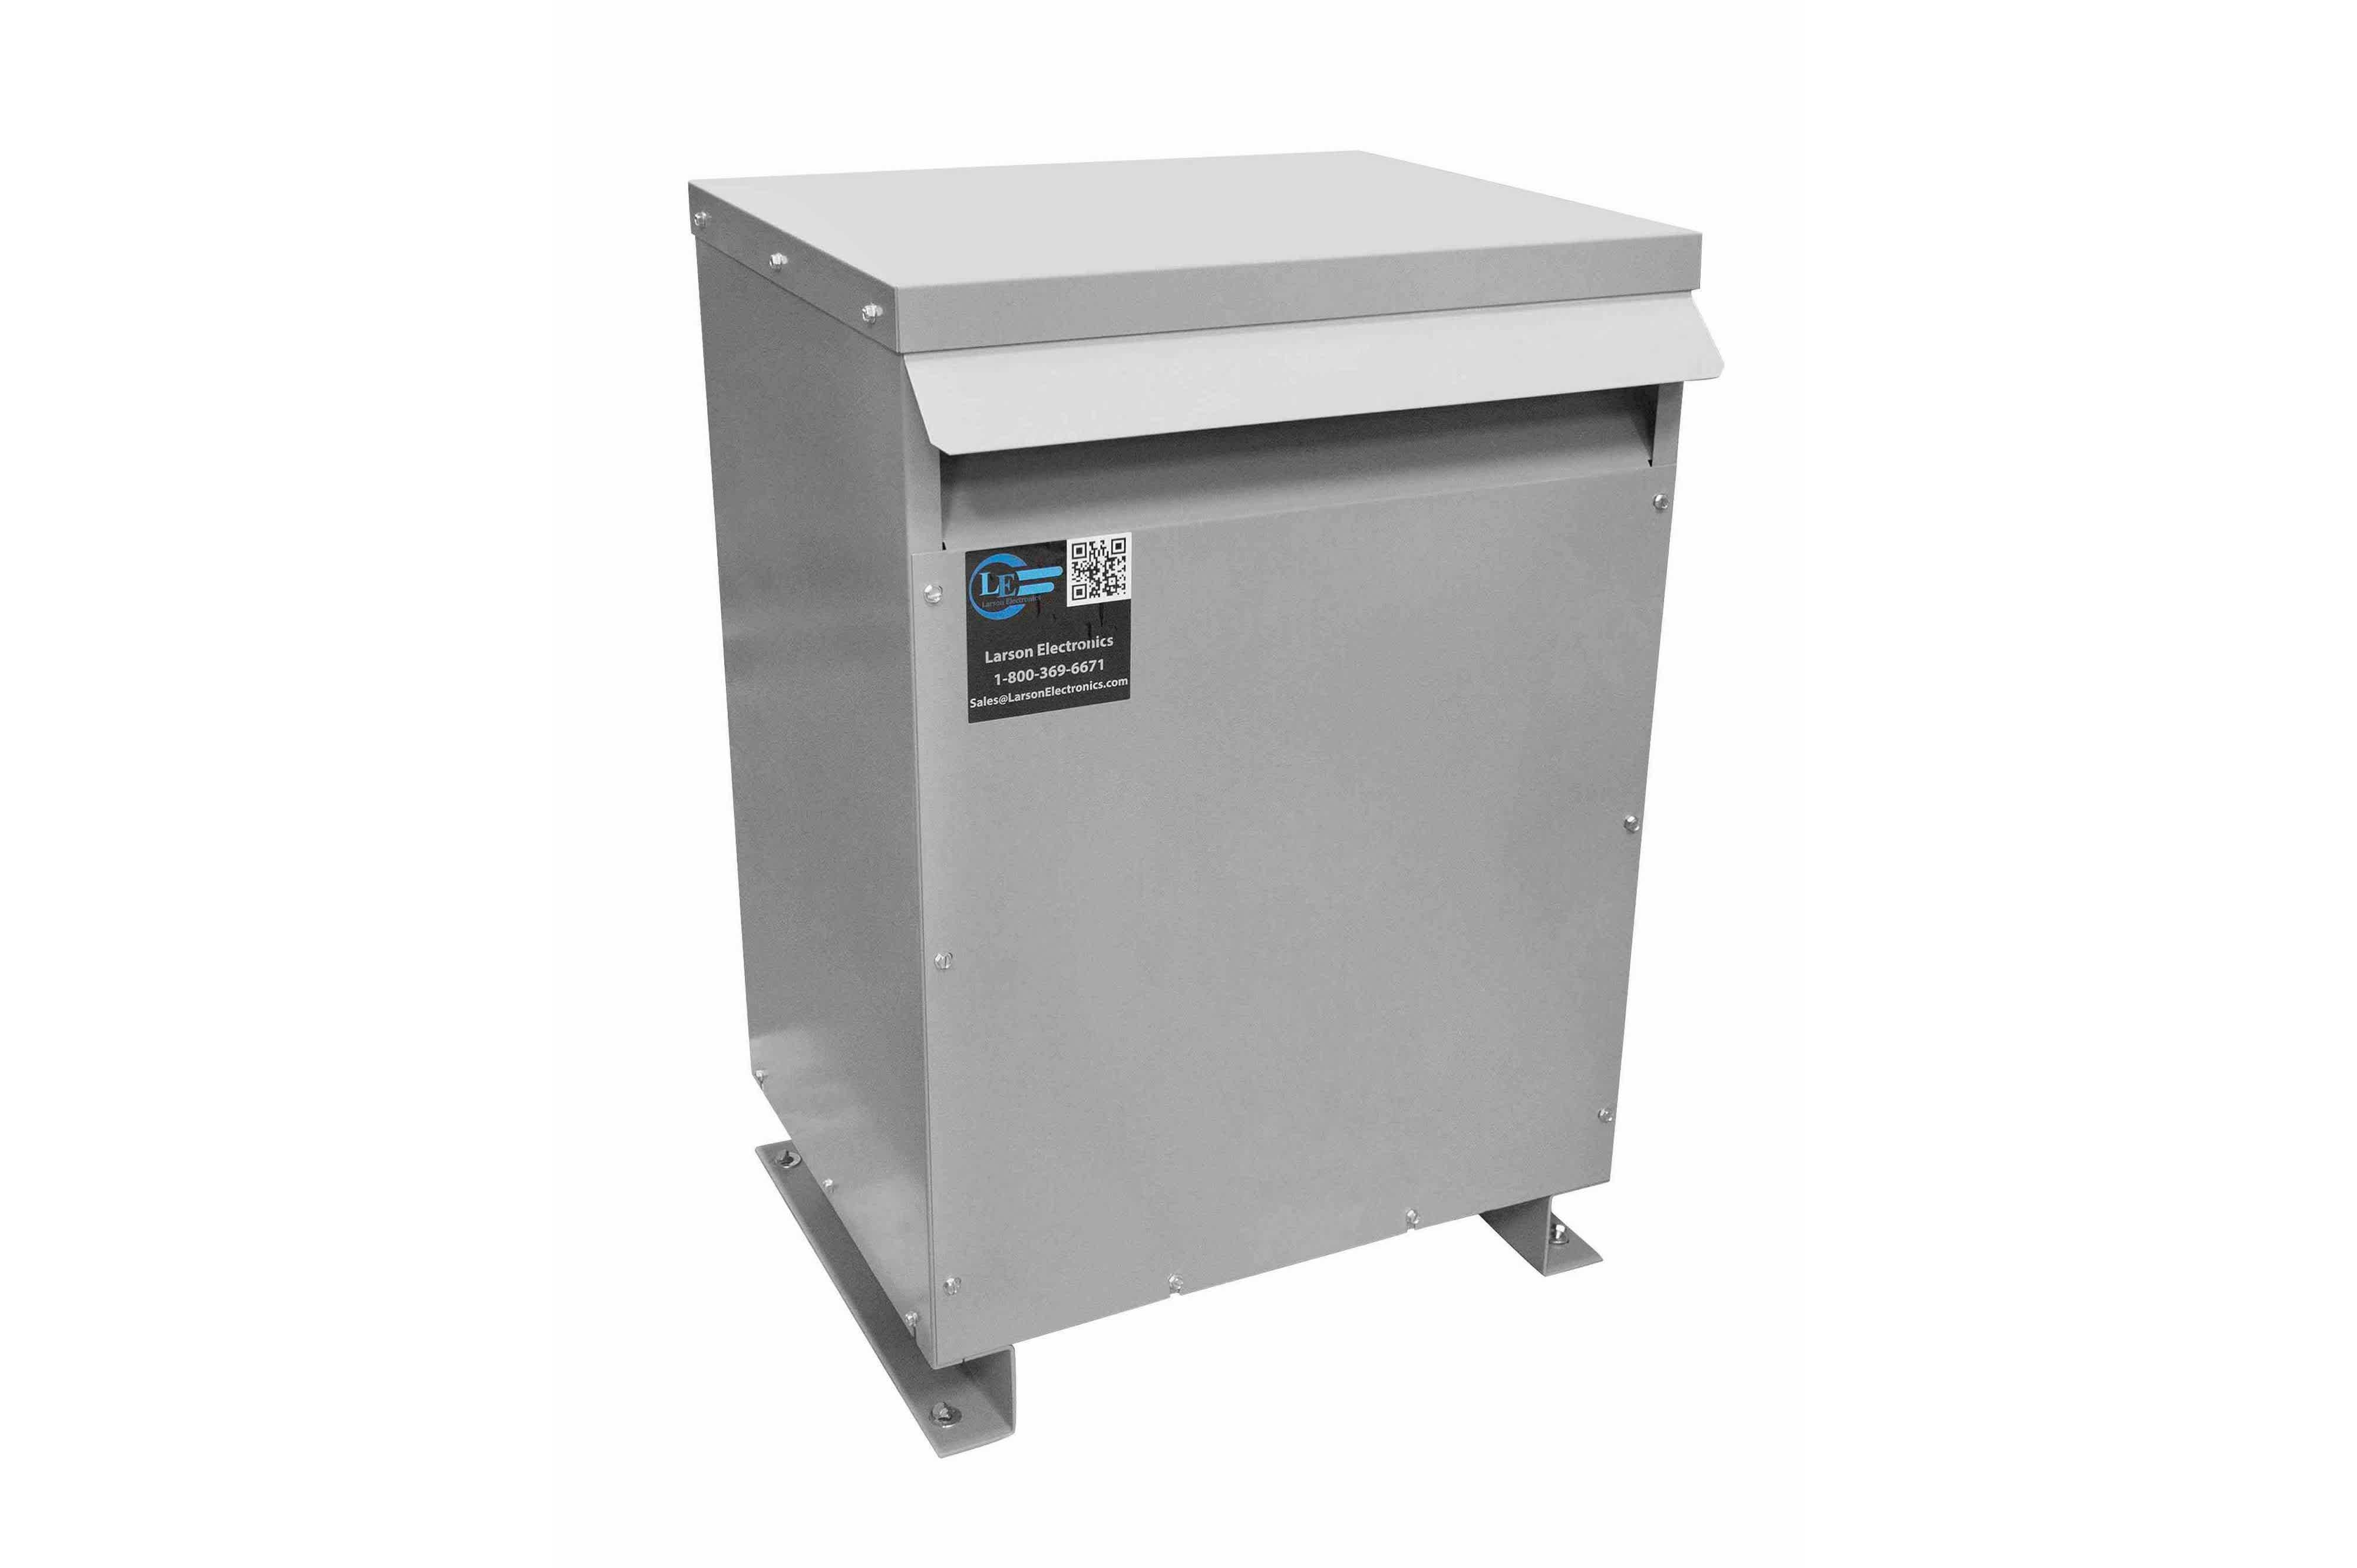 12 kVA 3PH Isolation Transformer, 575V Wye Primary, 208V Delta Secondary, N3R, Ventilated, 60 Hz